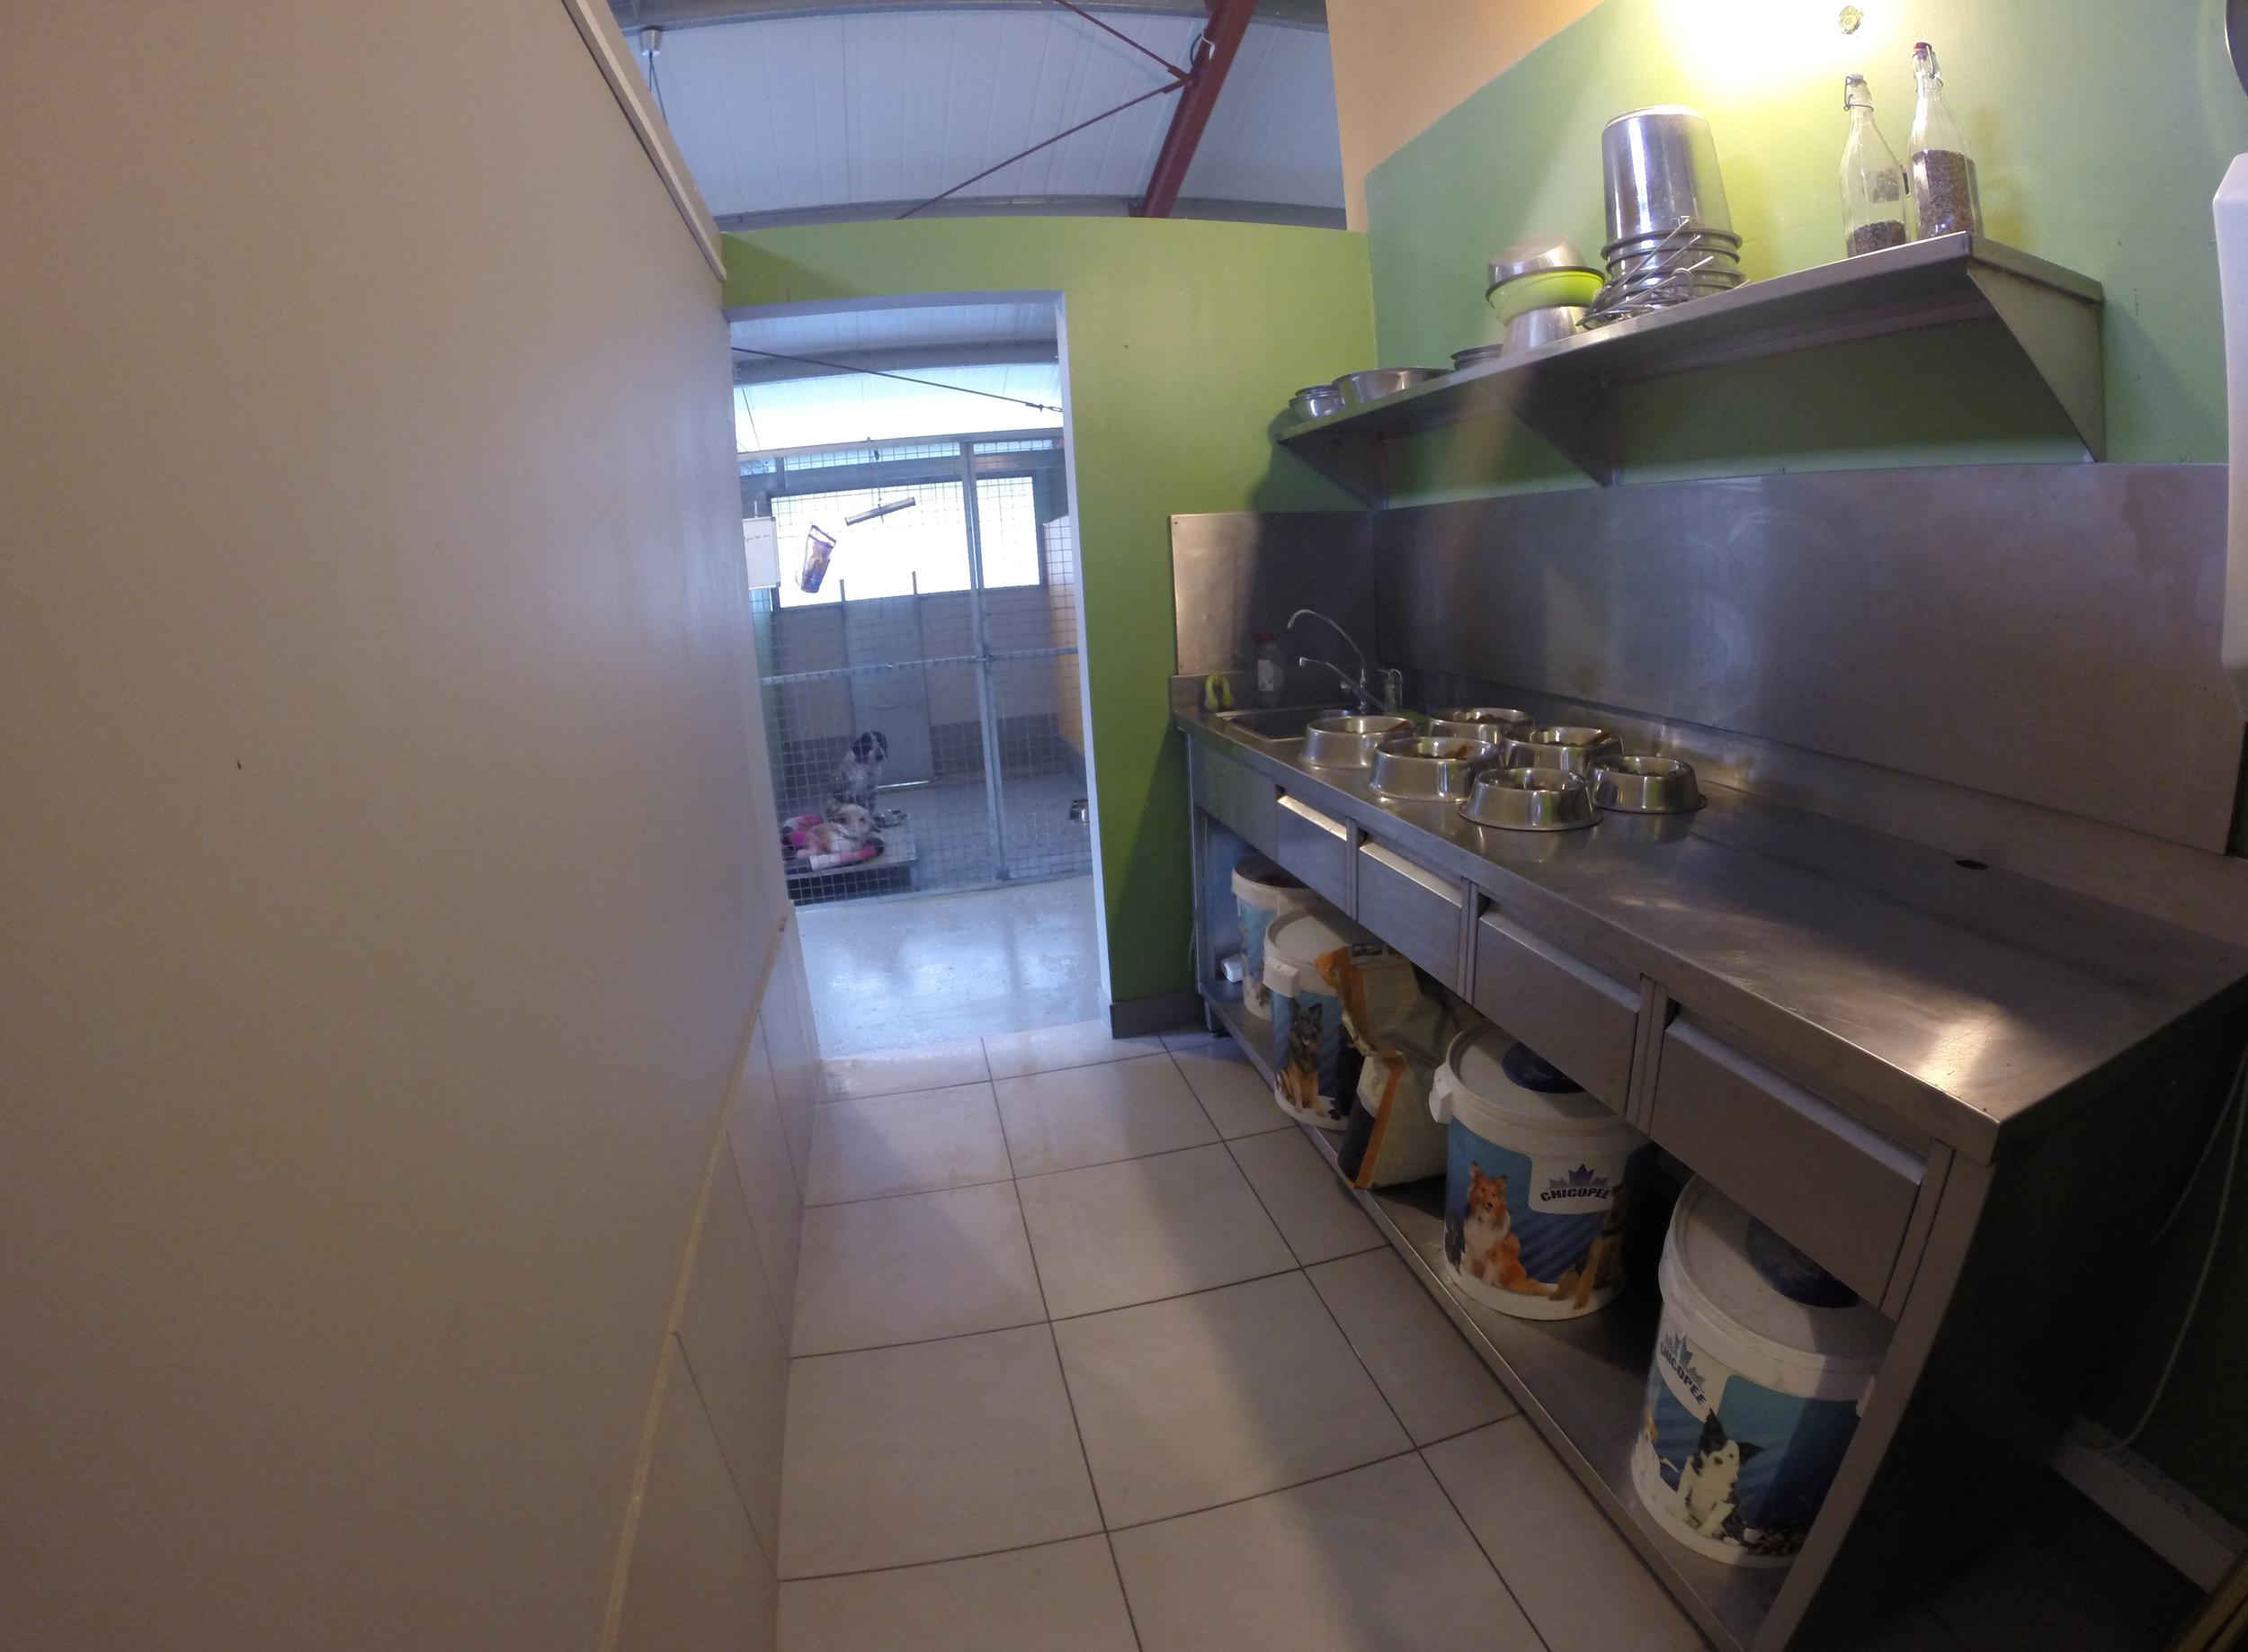 Dog Ranch | Cyprus Dog Hotel | Indoor Boarding Kennels | Kitchen area